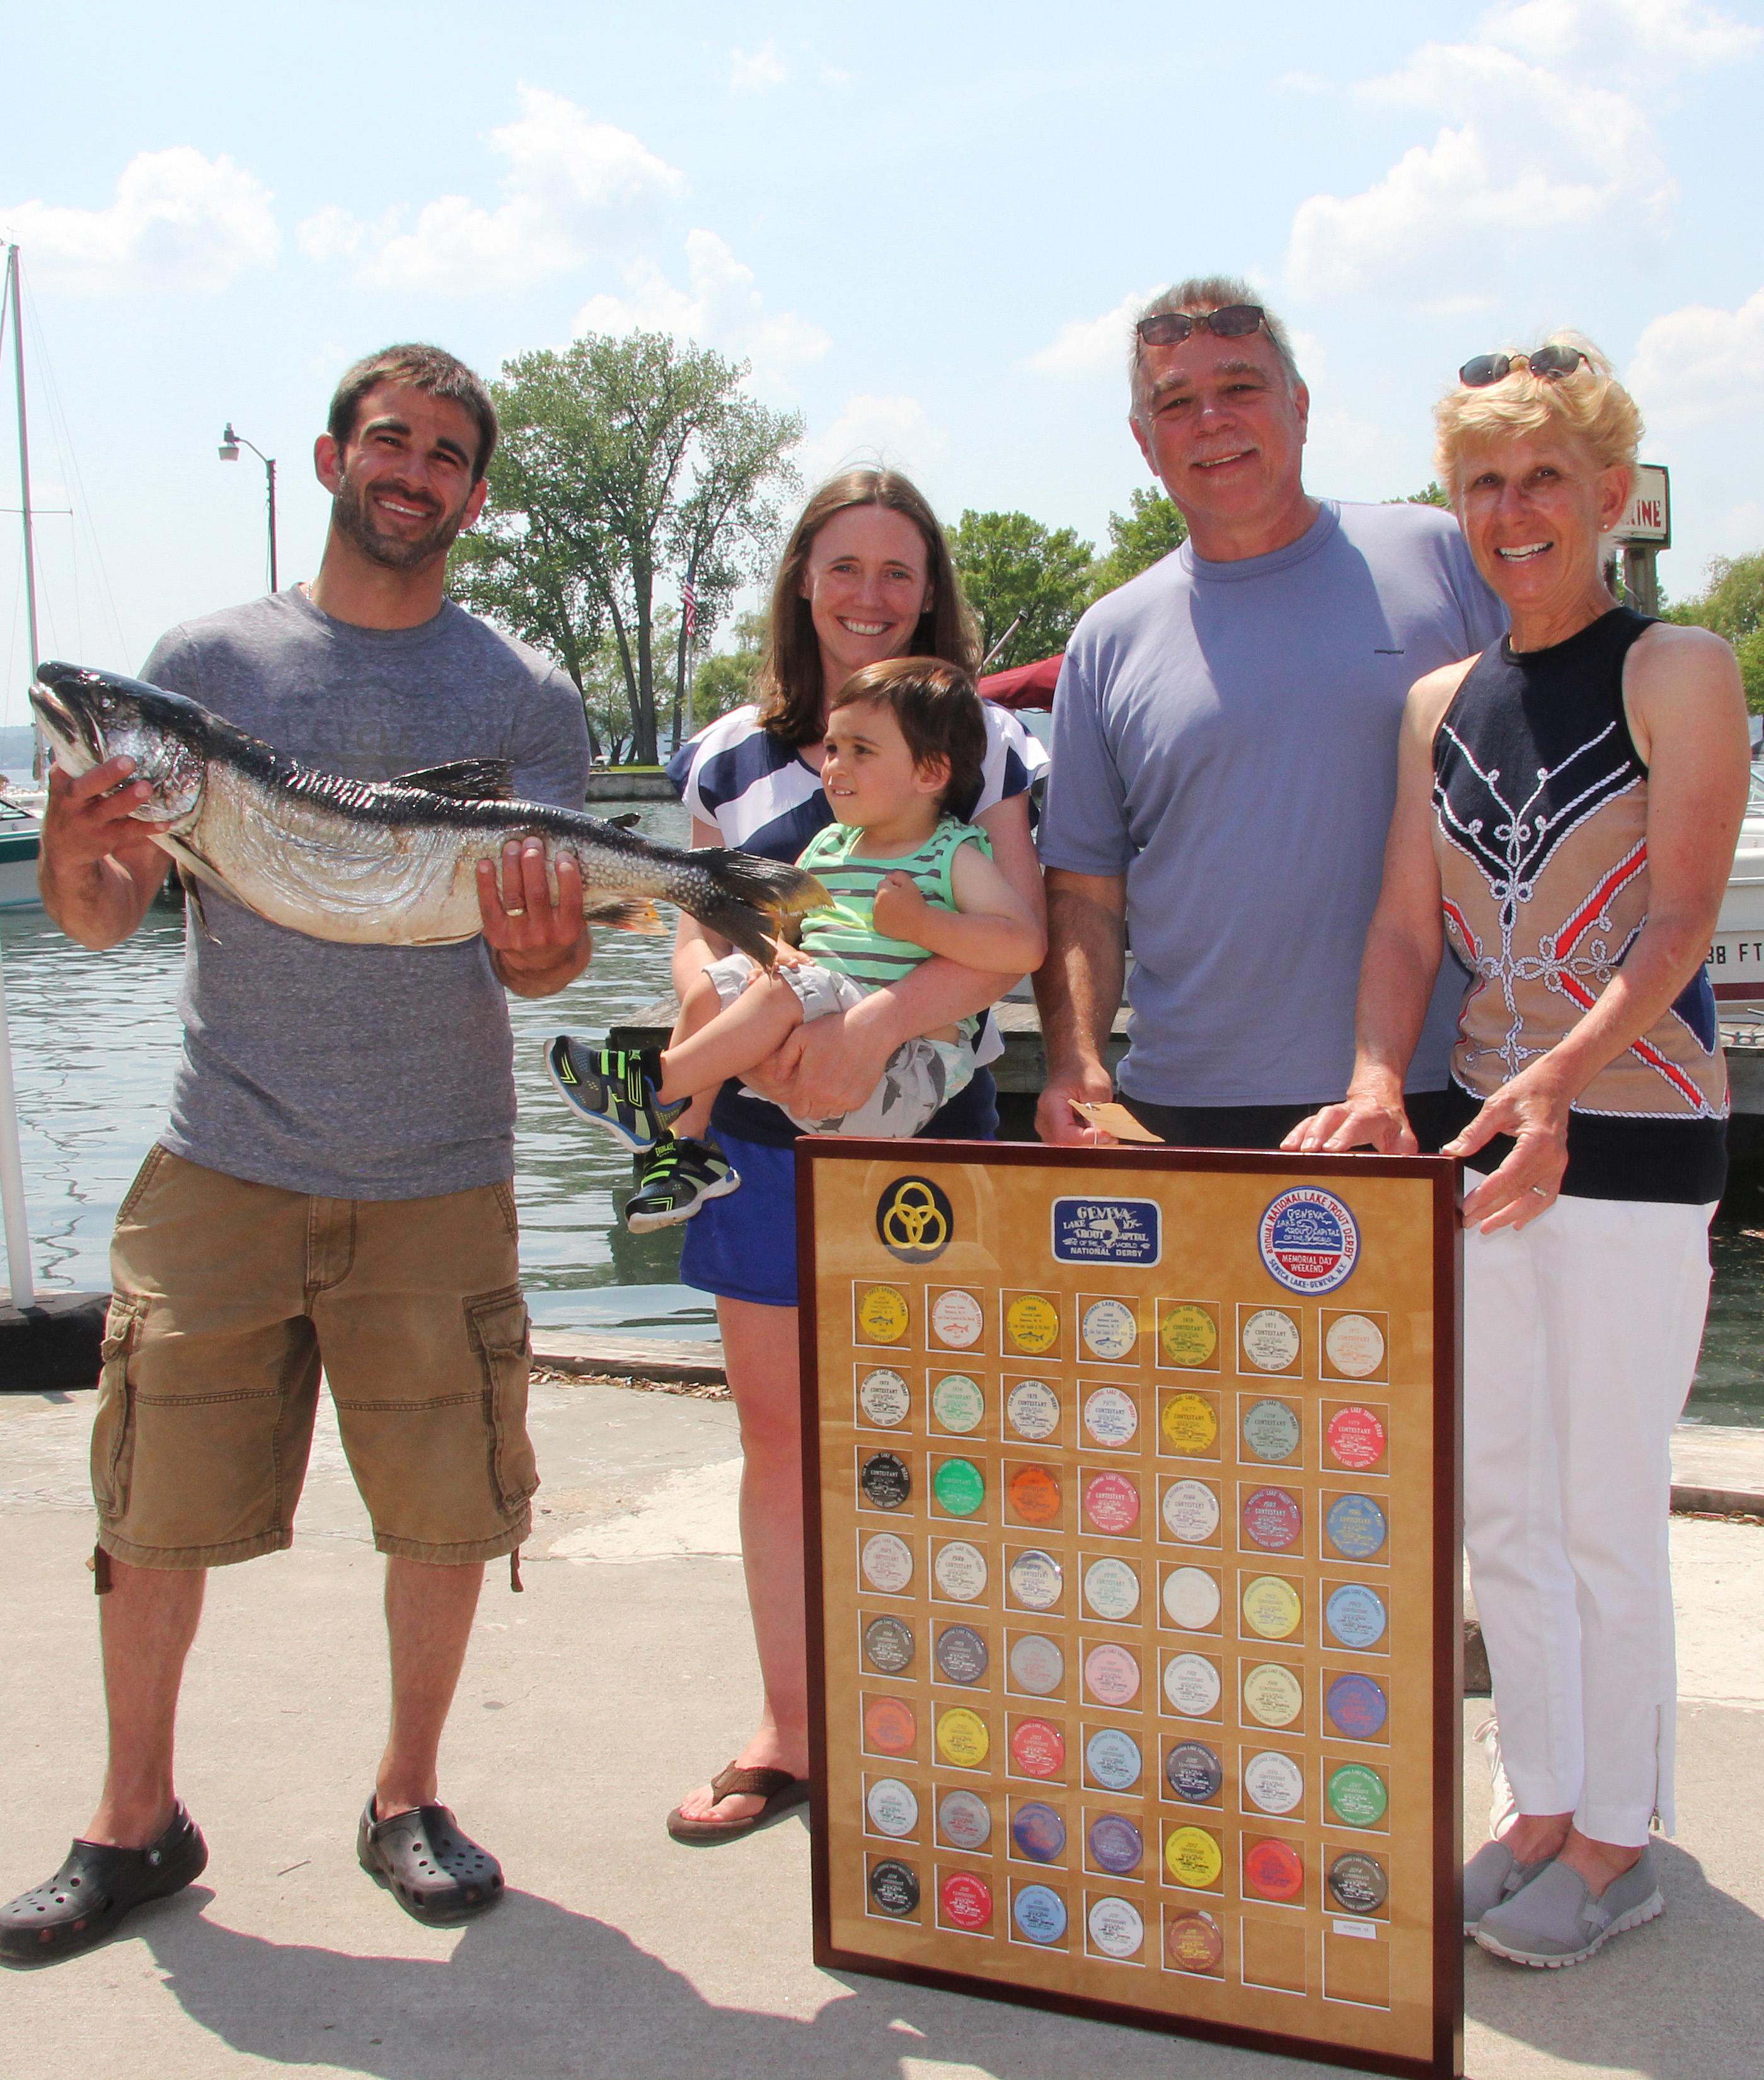 Gugliotta wins Seneca Lake Derby – The Buffalo News